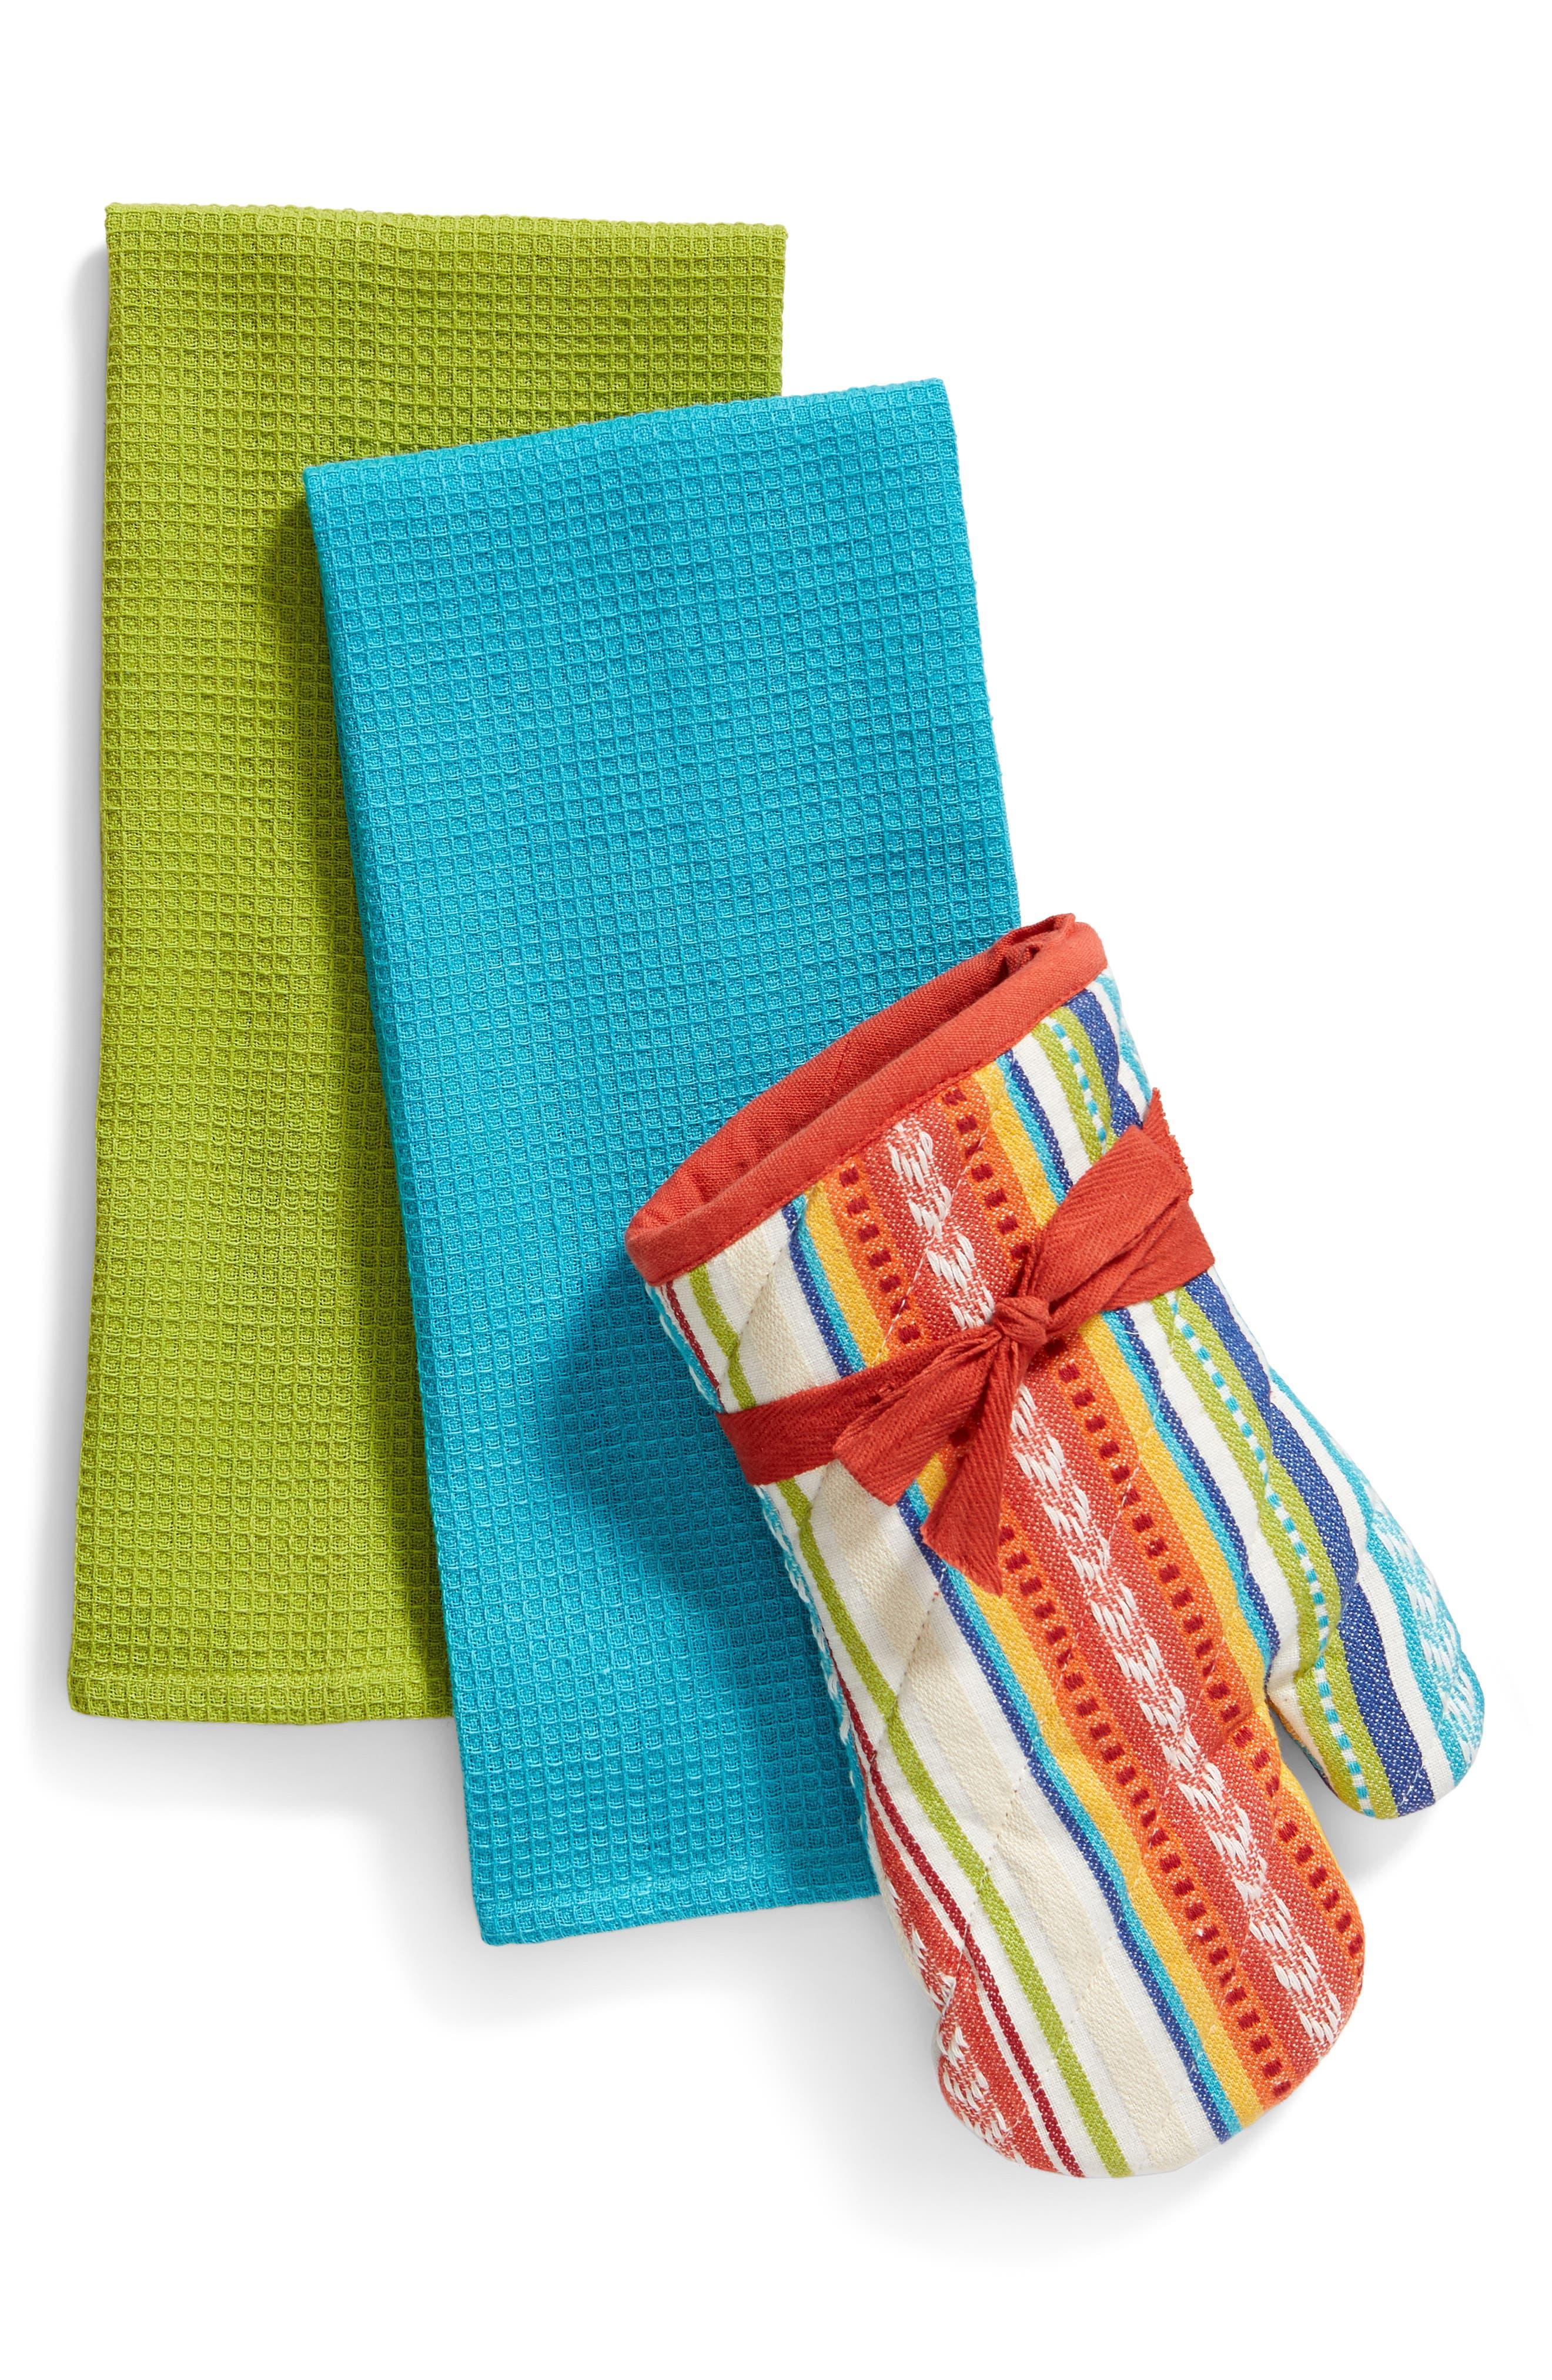 Design Imports Baja Cantina Oven Mitt & Towel Set